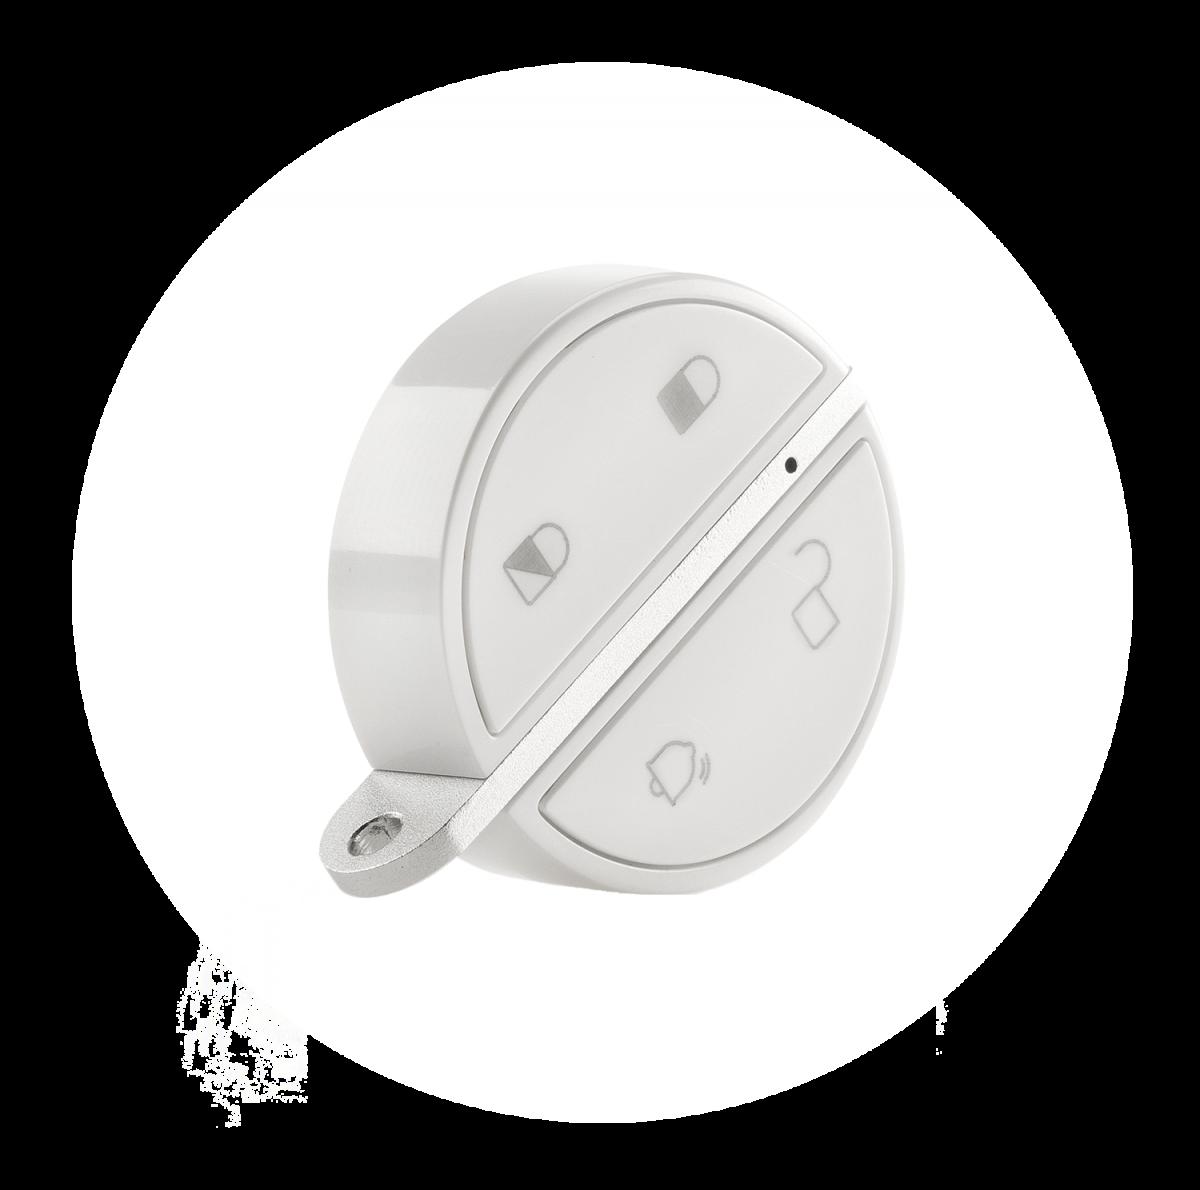 Myfox badge home alarm